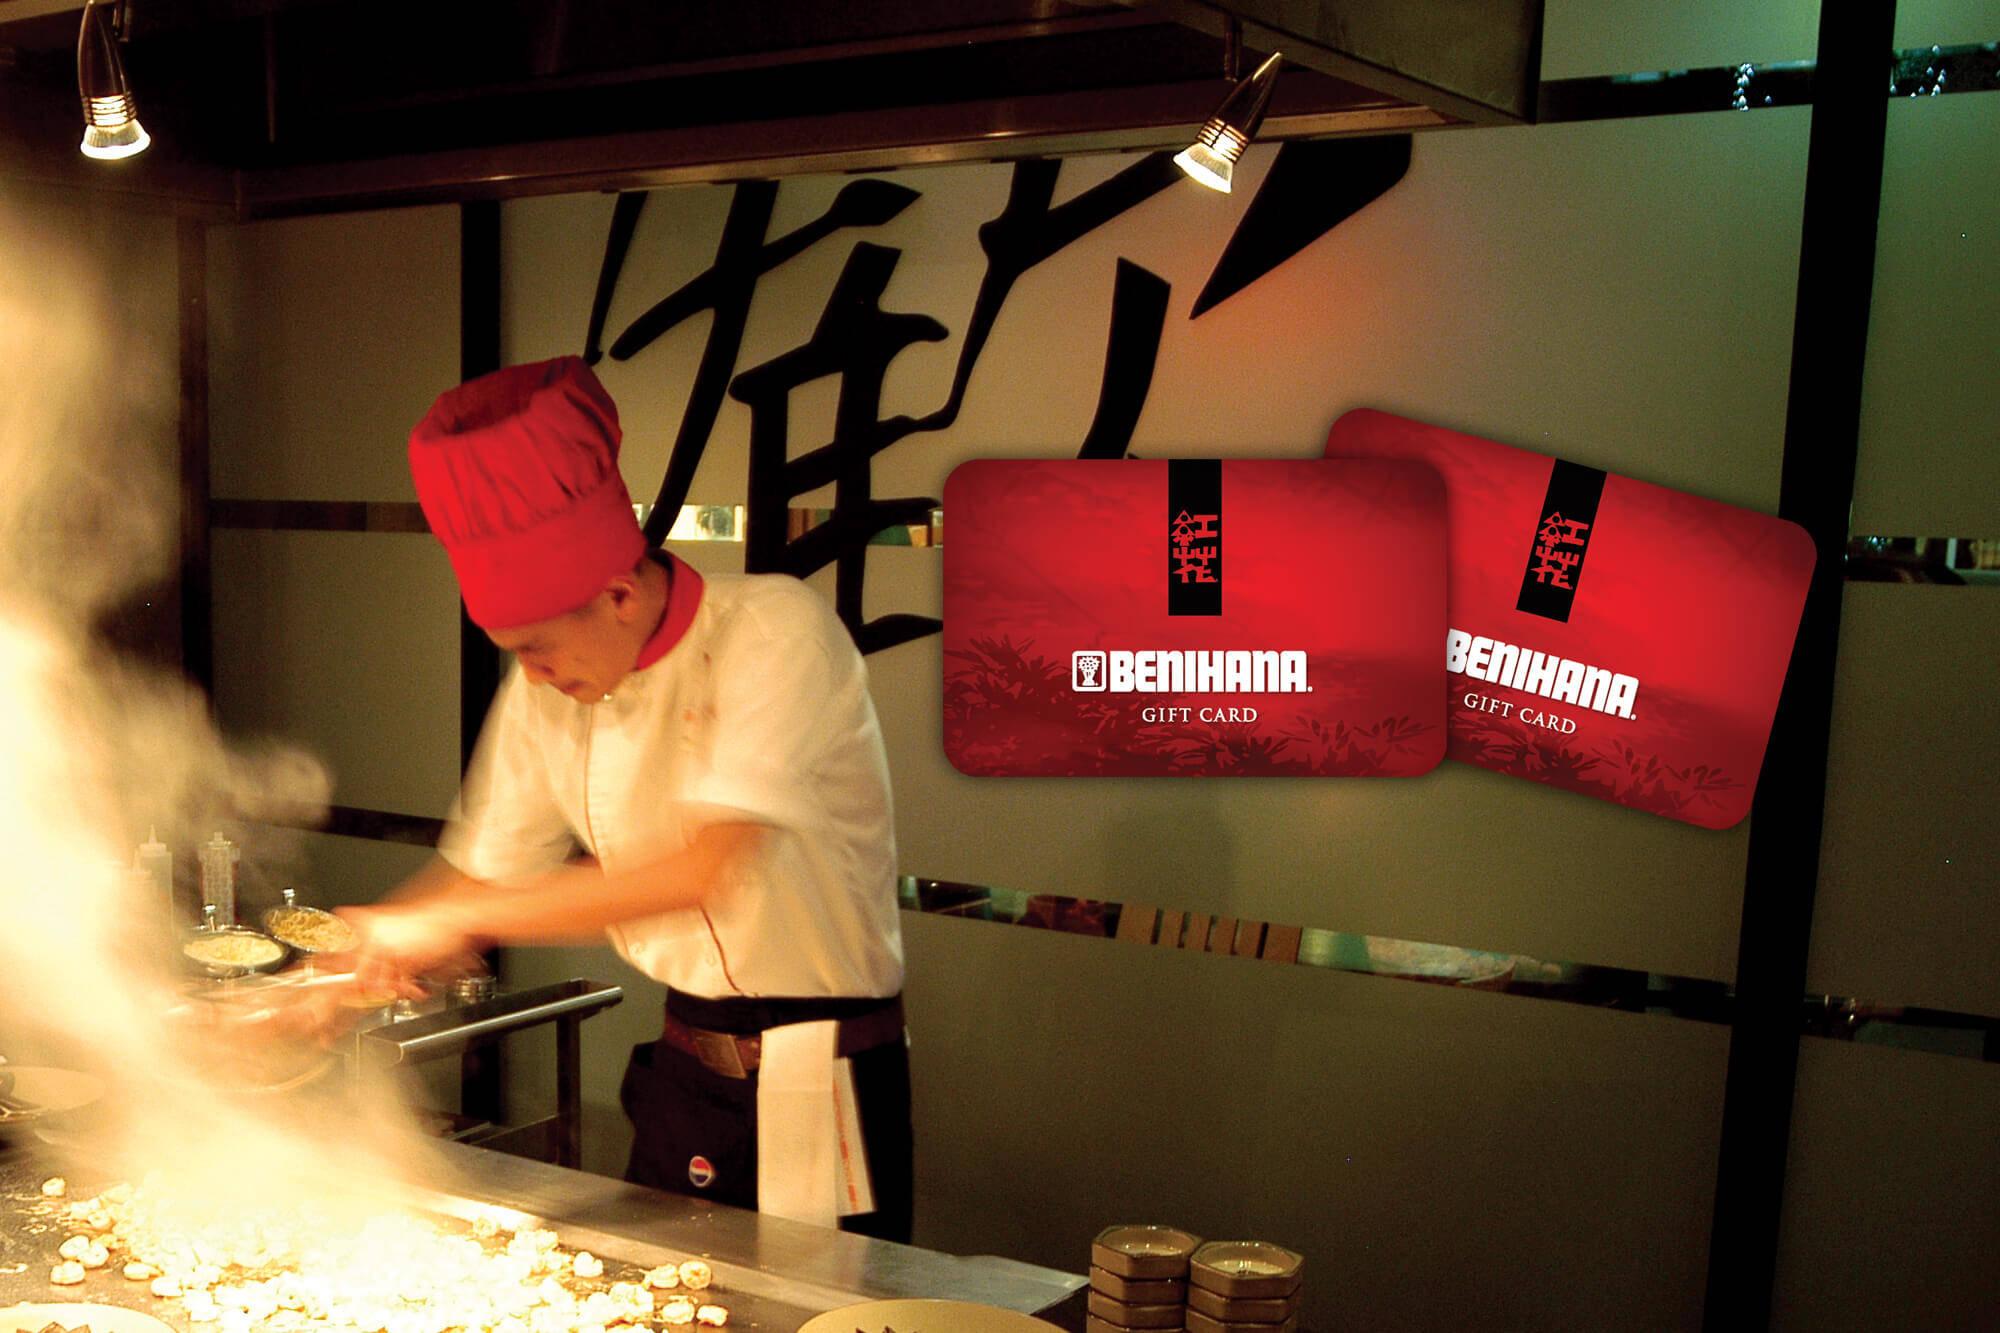 sushi ese steakhouse gift cards from benihana benihana